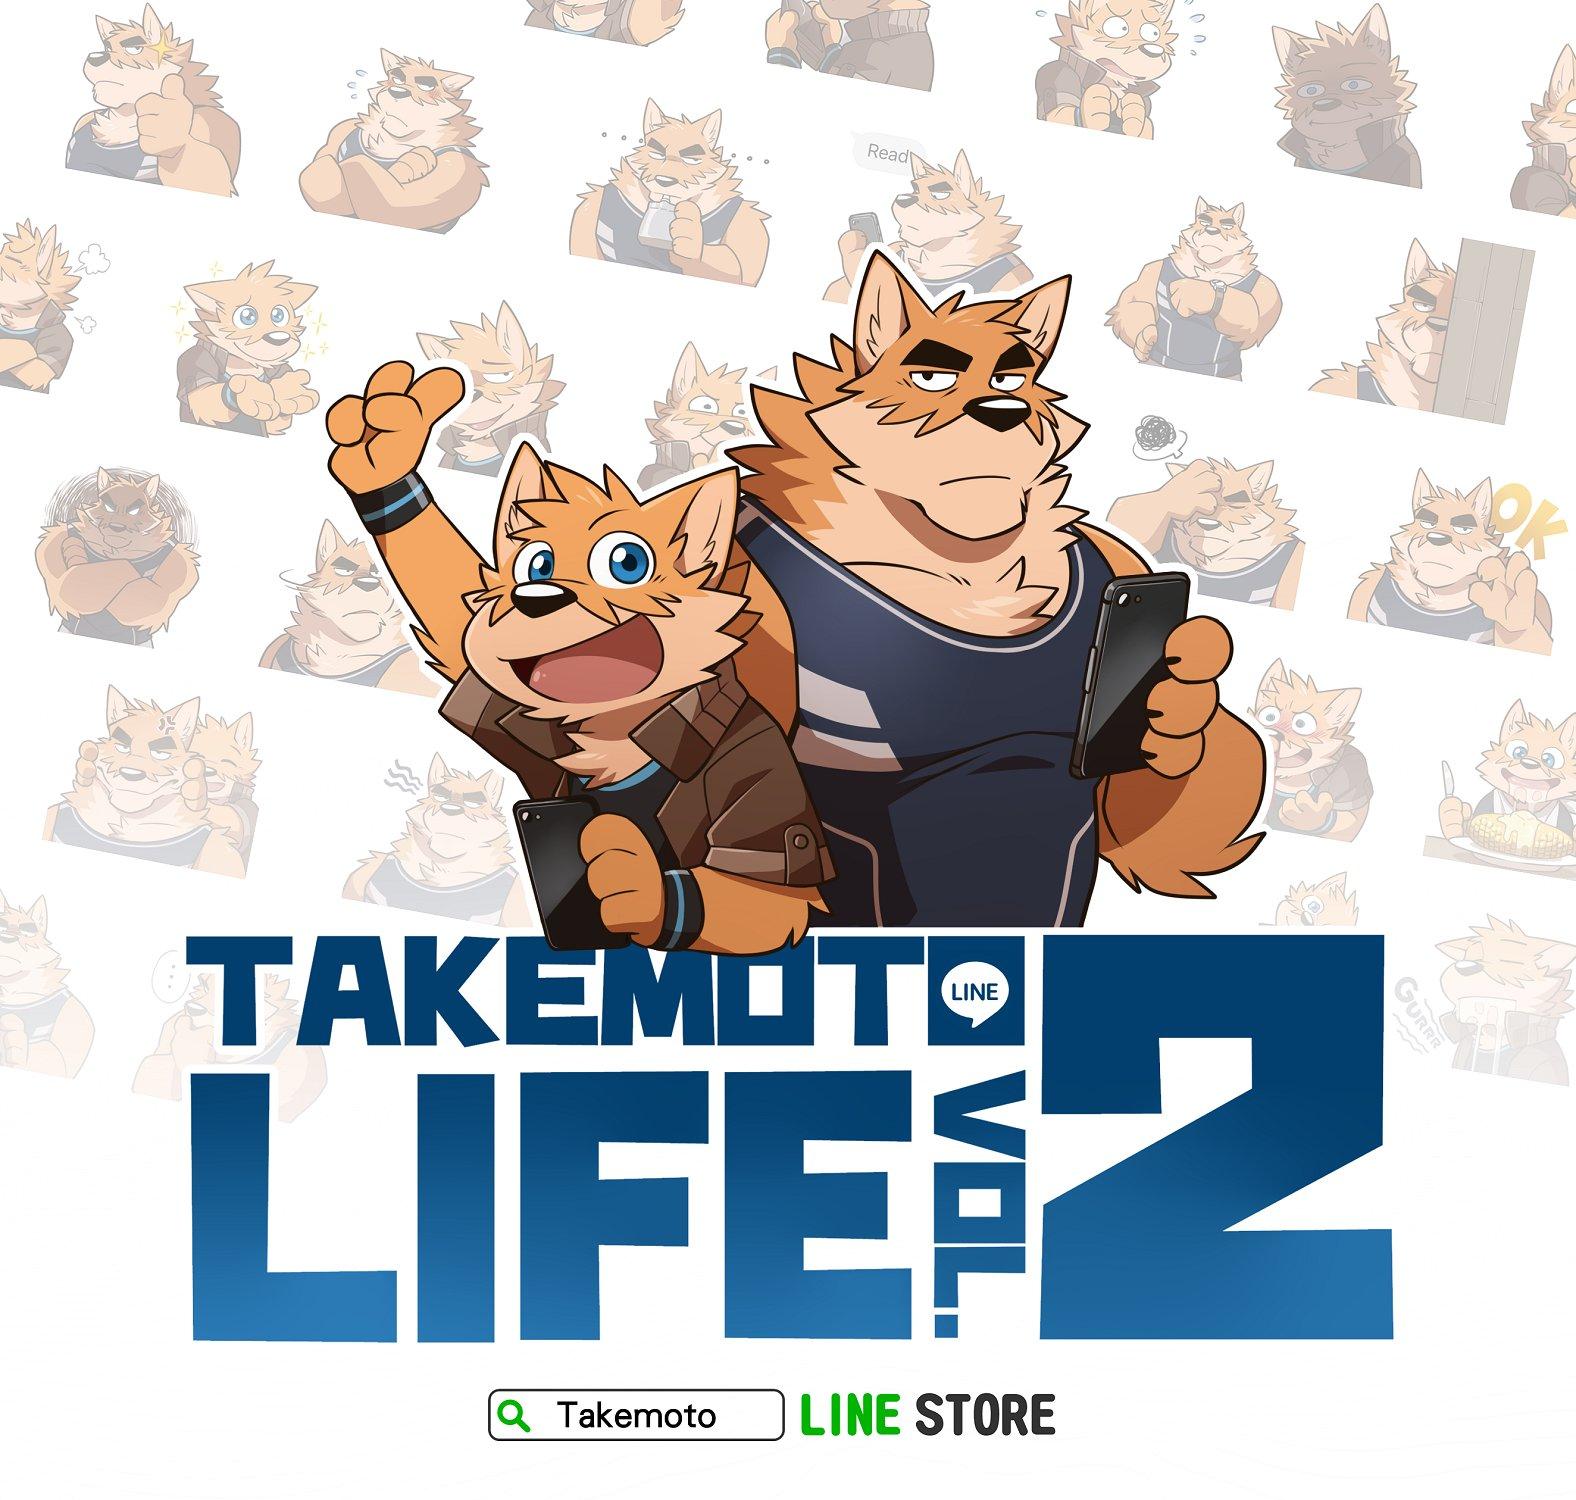 Takemoto 竹本 on Twitter: